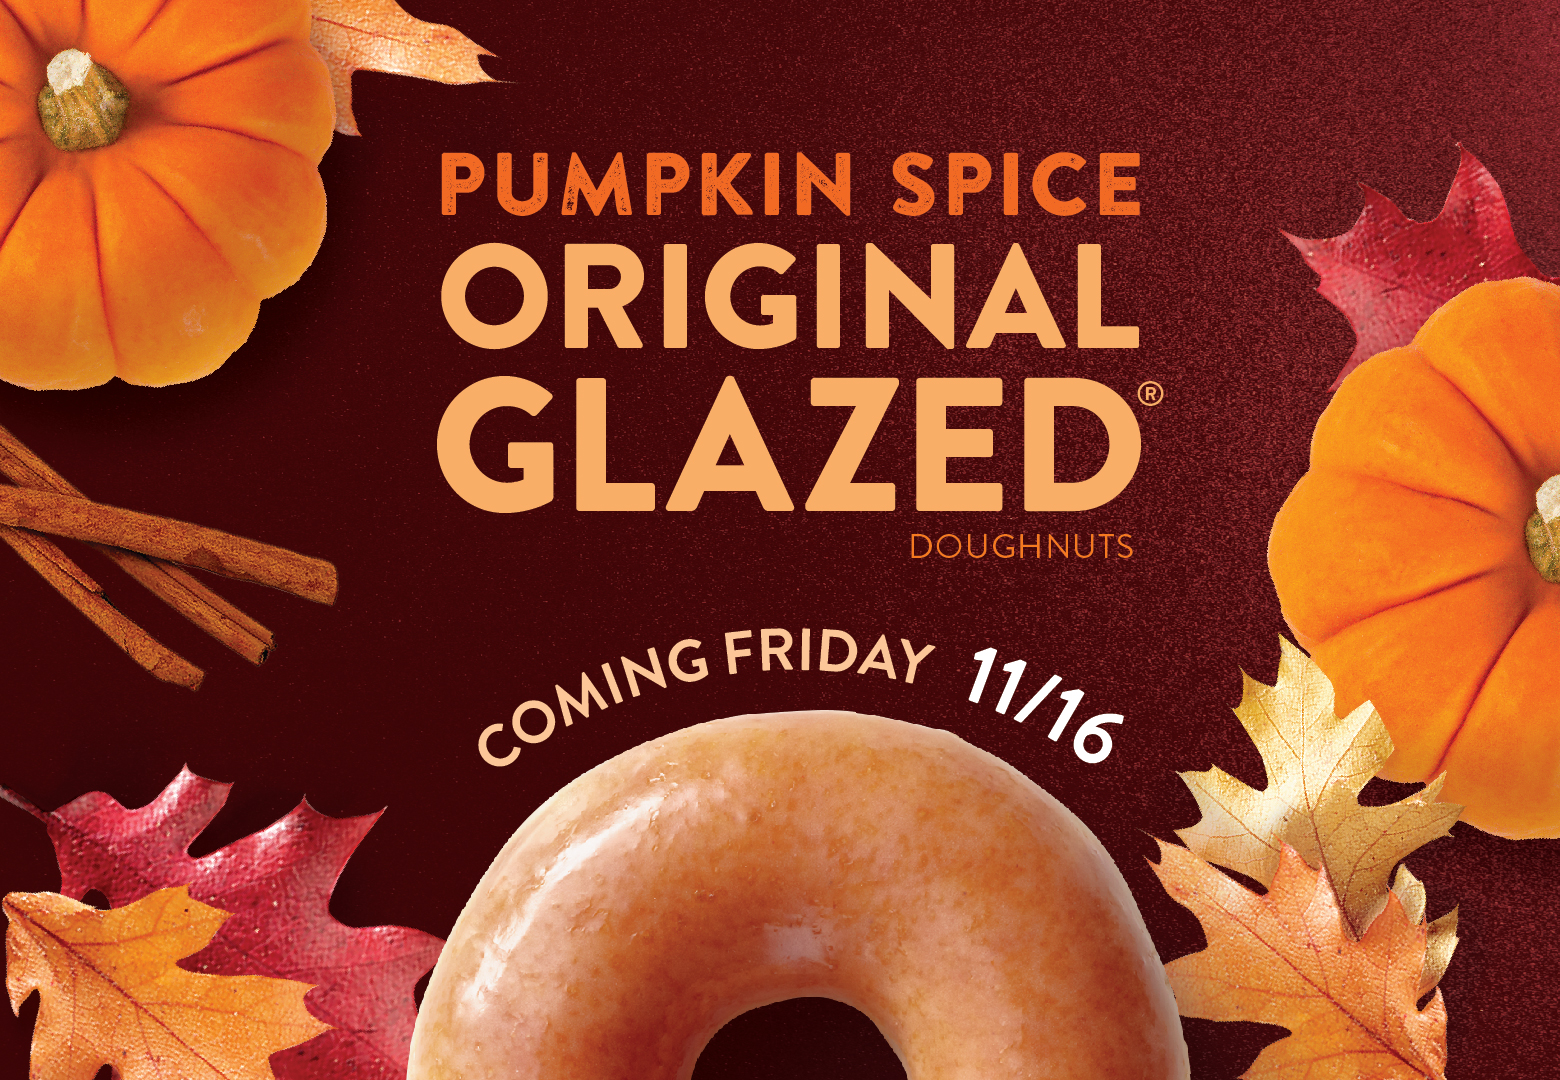 Pumpkin Spice Original Glazed doughnuts coming Friday November 16th